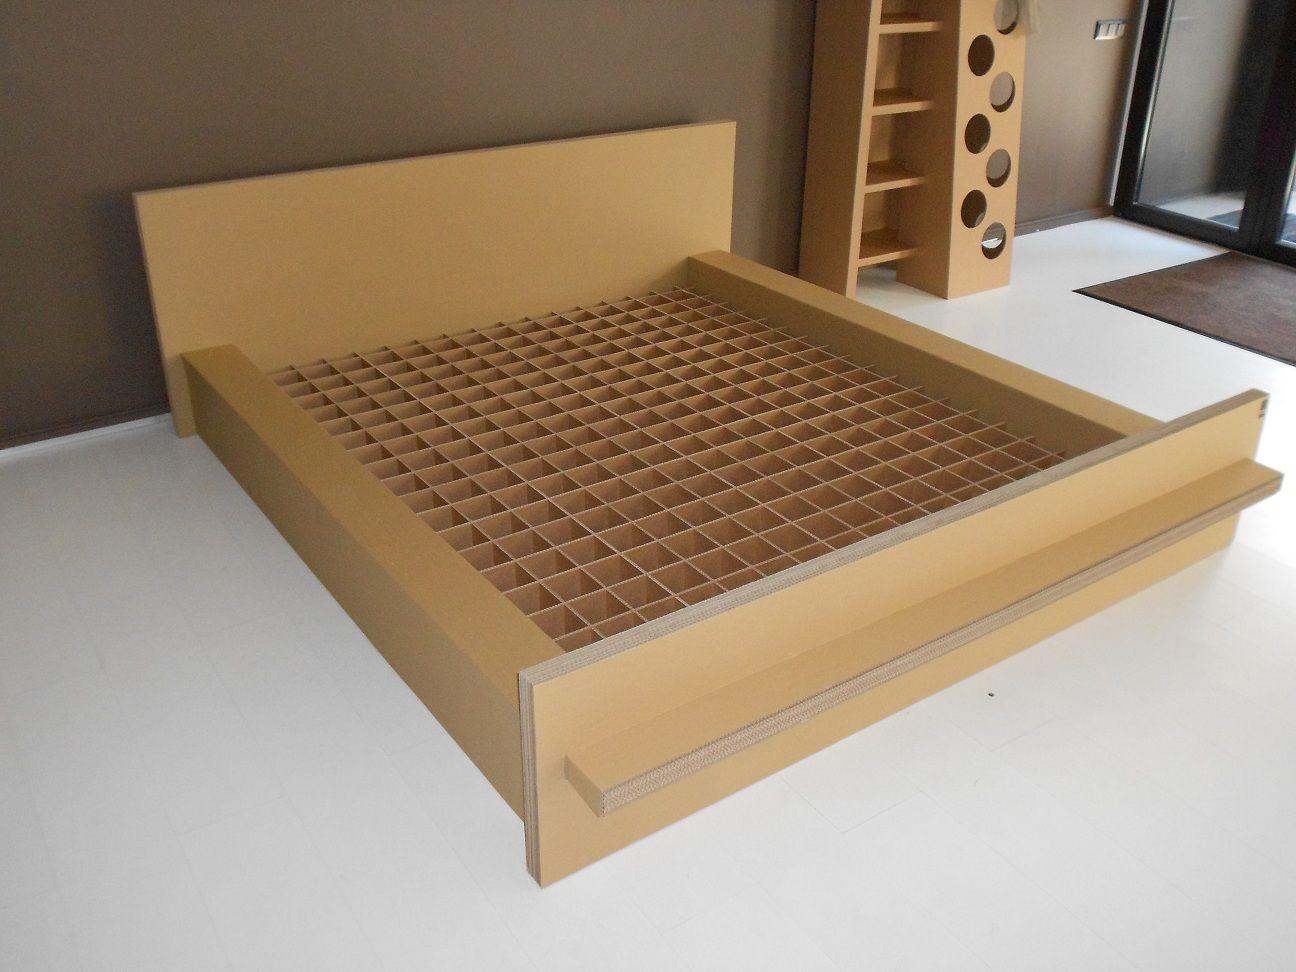 1000 images about muebles de cartn cardboard furniture on pinterest cardboard chair cardboard furniture and chairs card board furniture